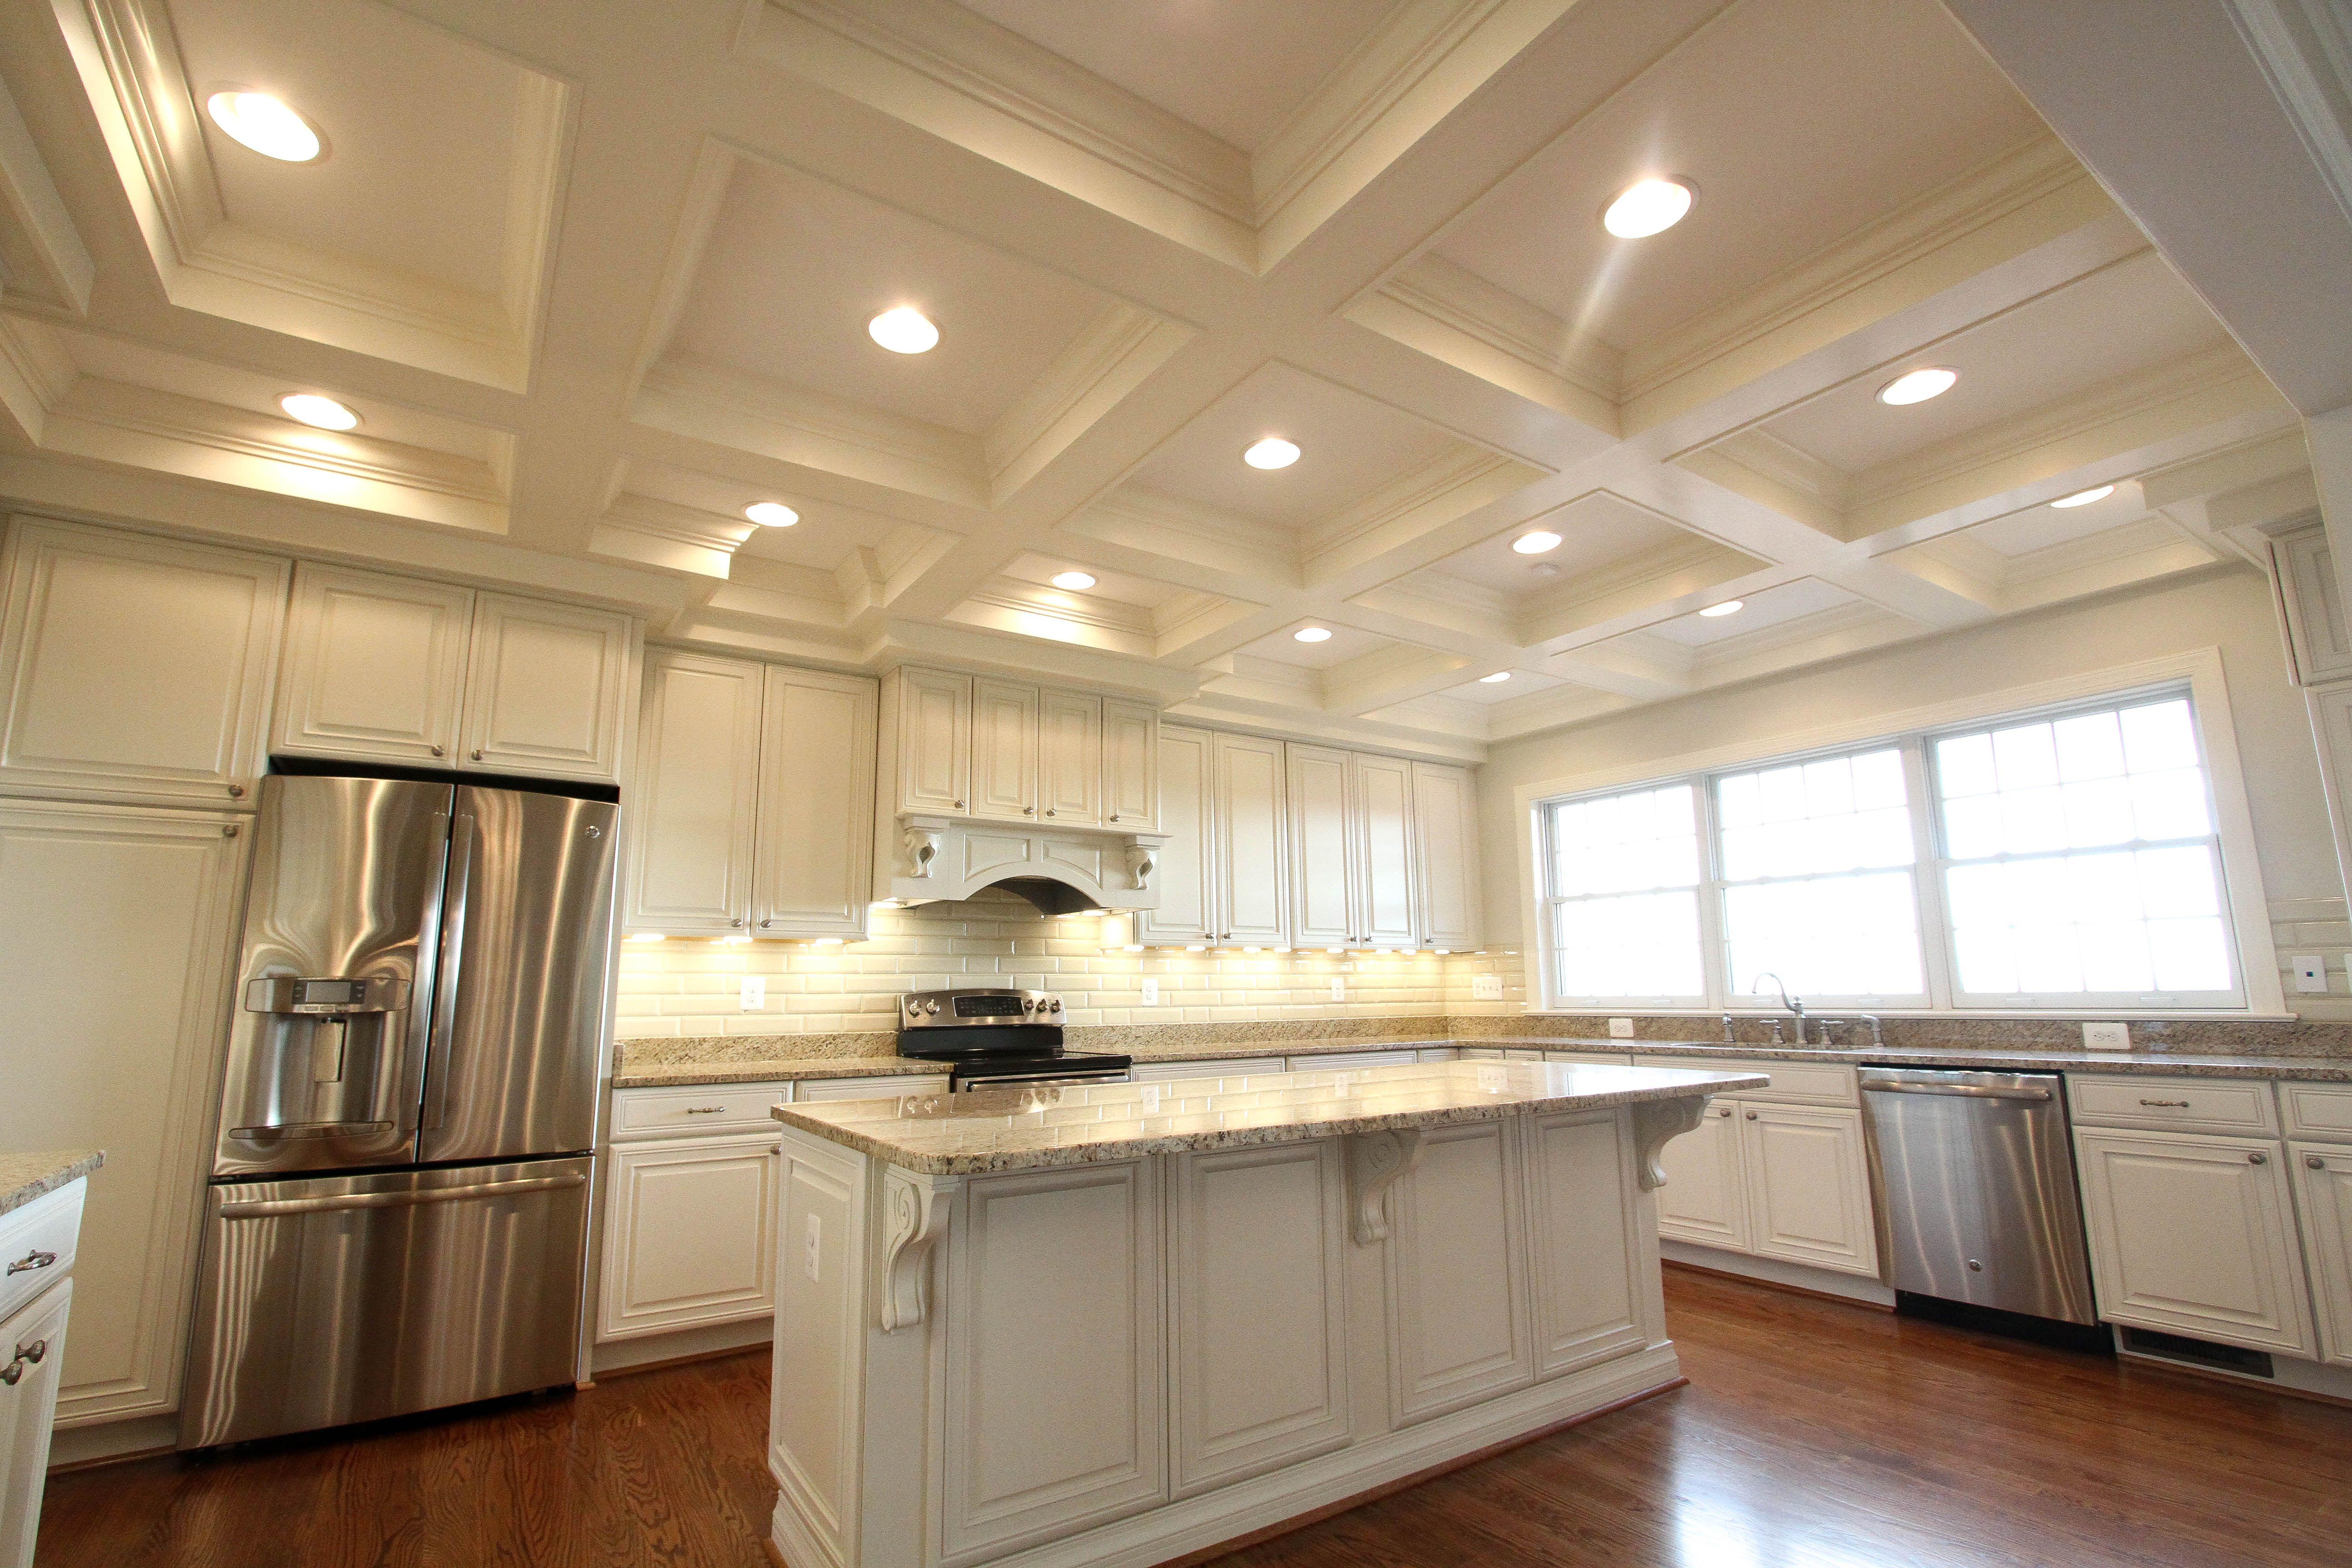 Kitchen, Gourmet Kitchen, Stainless Steel, Custom Coffered Ceiling, Subway Tile, Hardwood Flooring, Granite Countertop, Custom Built by Foreman Builders, Virginia